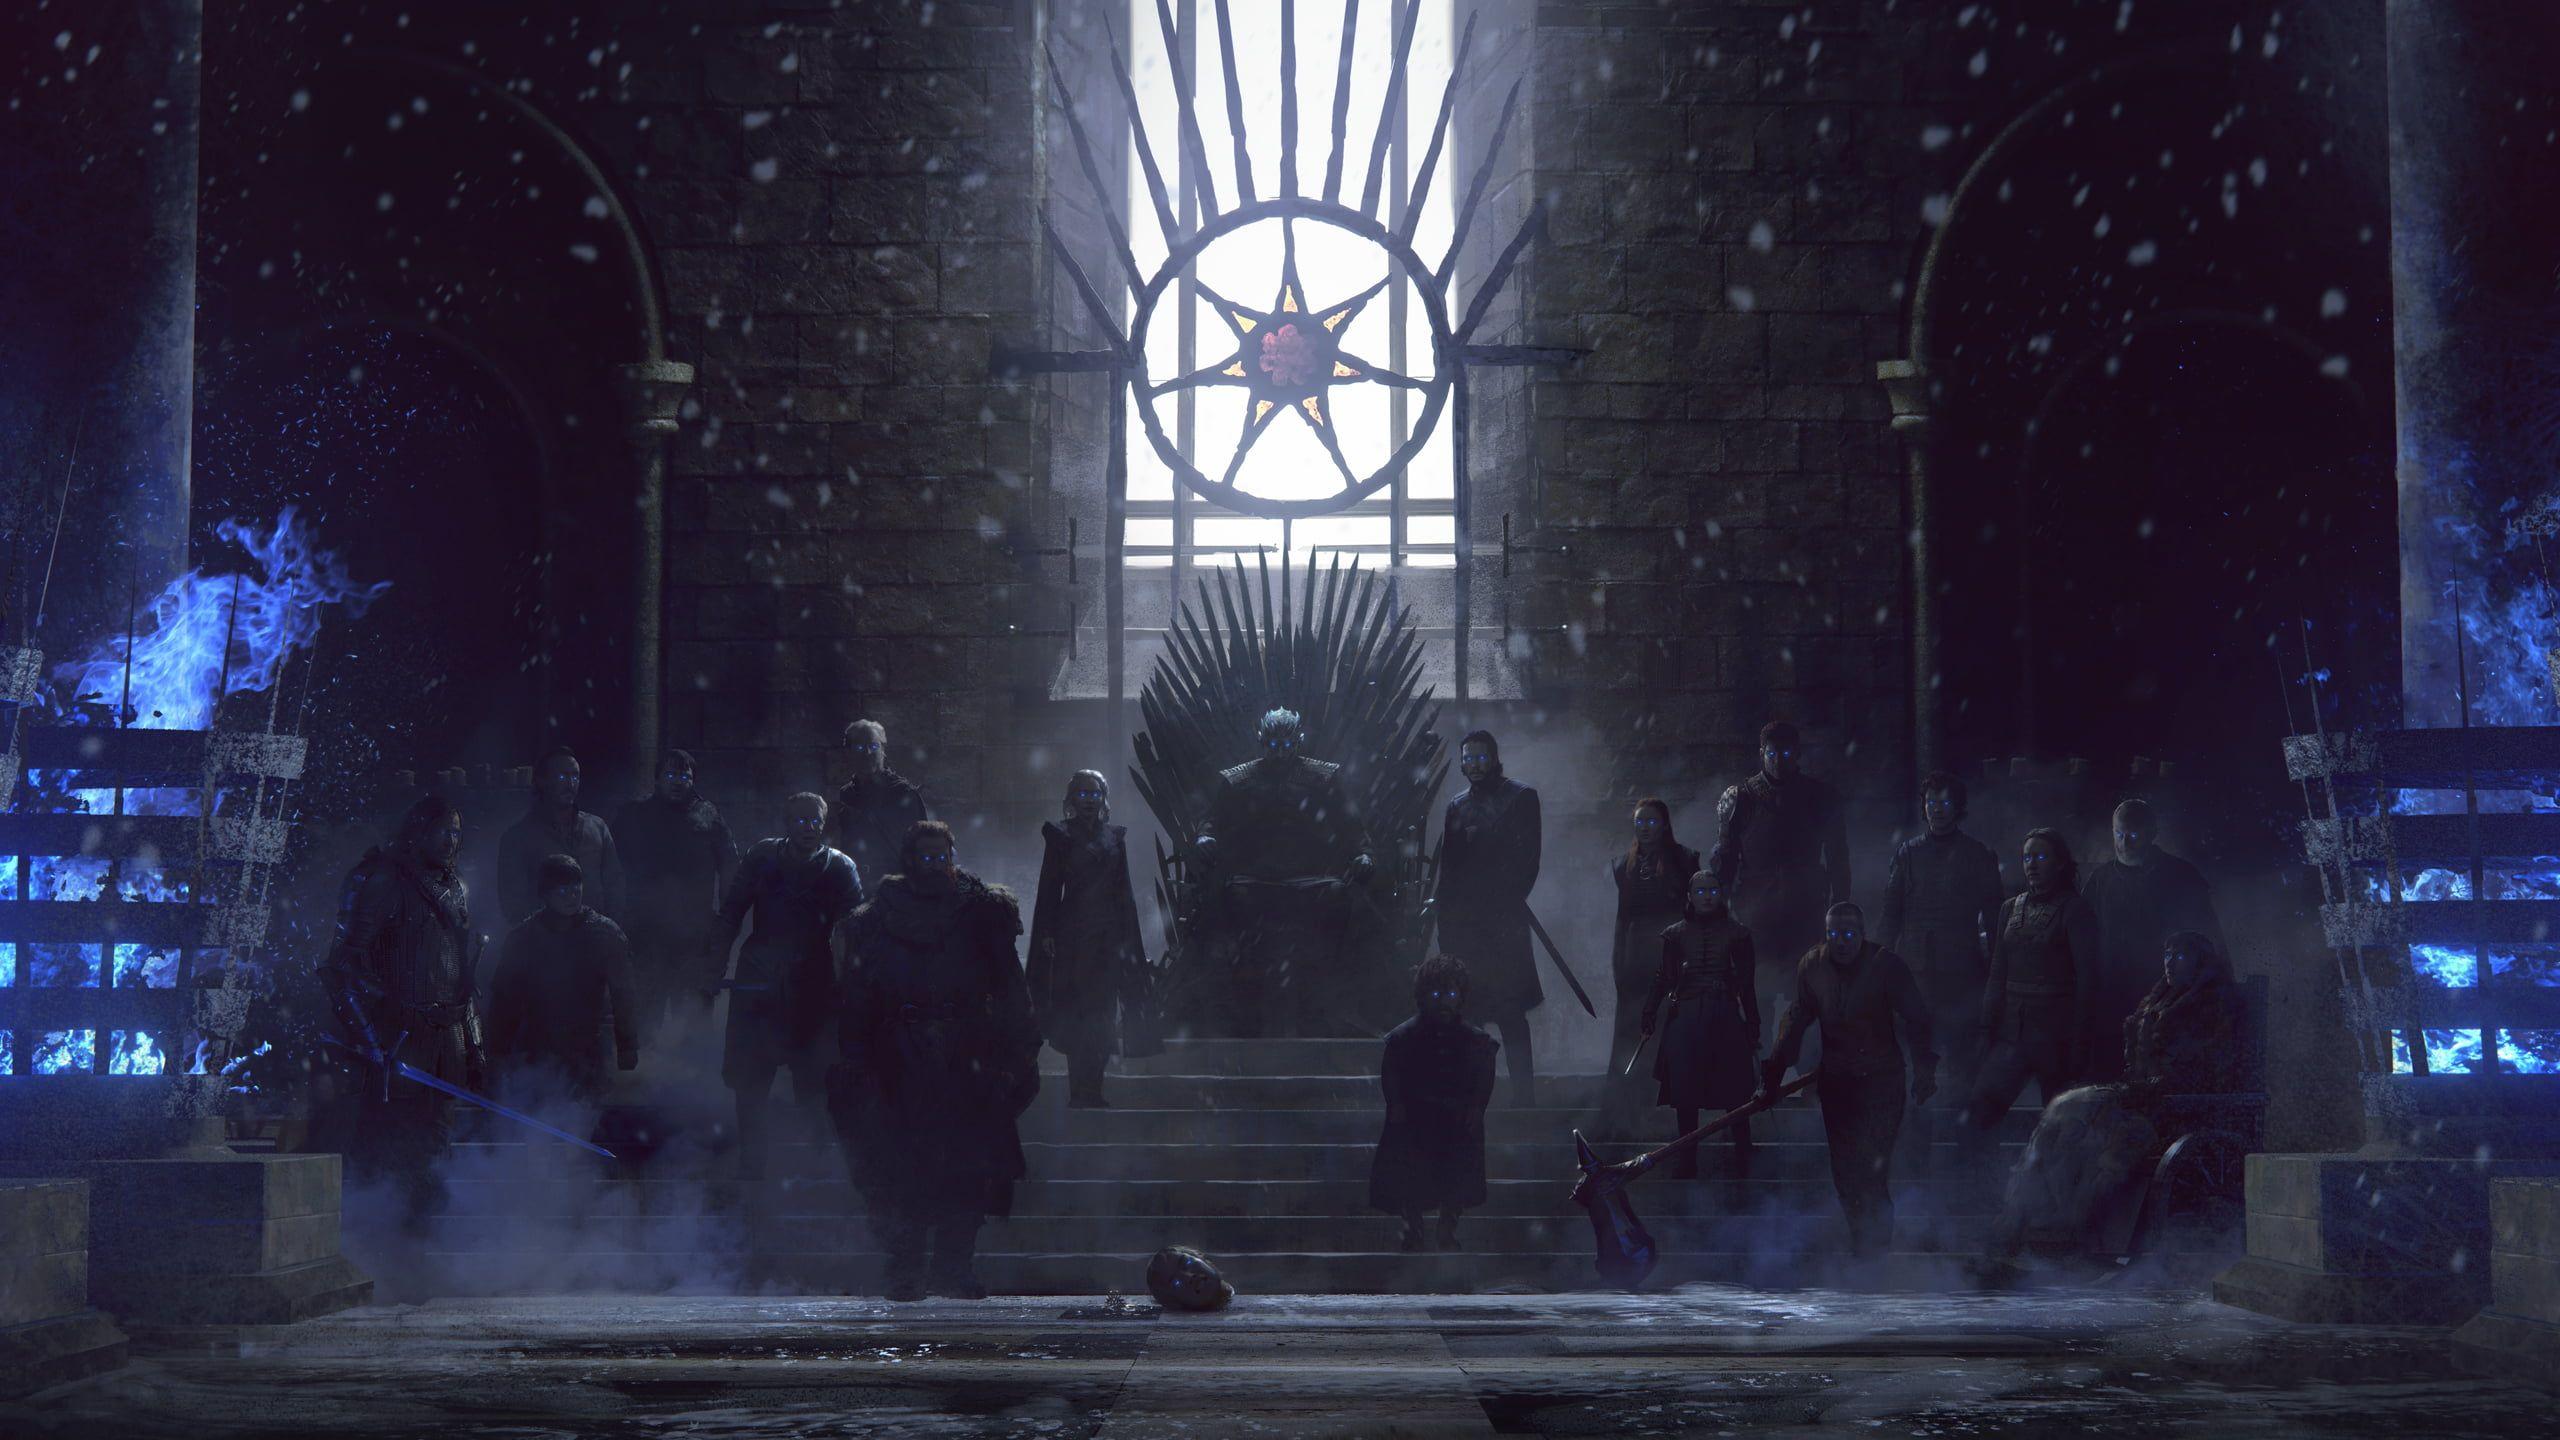 Tv Show Game Of Thrones Arya Stark Bran Stark Brienne Of Tarth Bronn Game Of Thrones Cersei Lan Background Images Wallpapers Hd Wallpaper Character Wallpaper